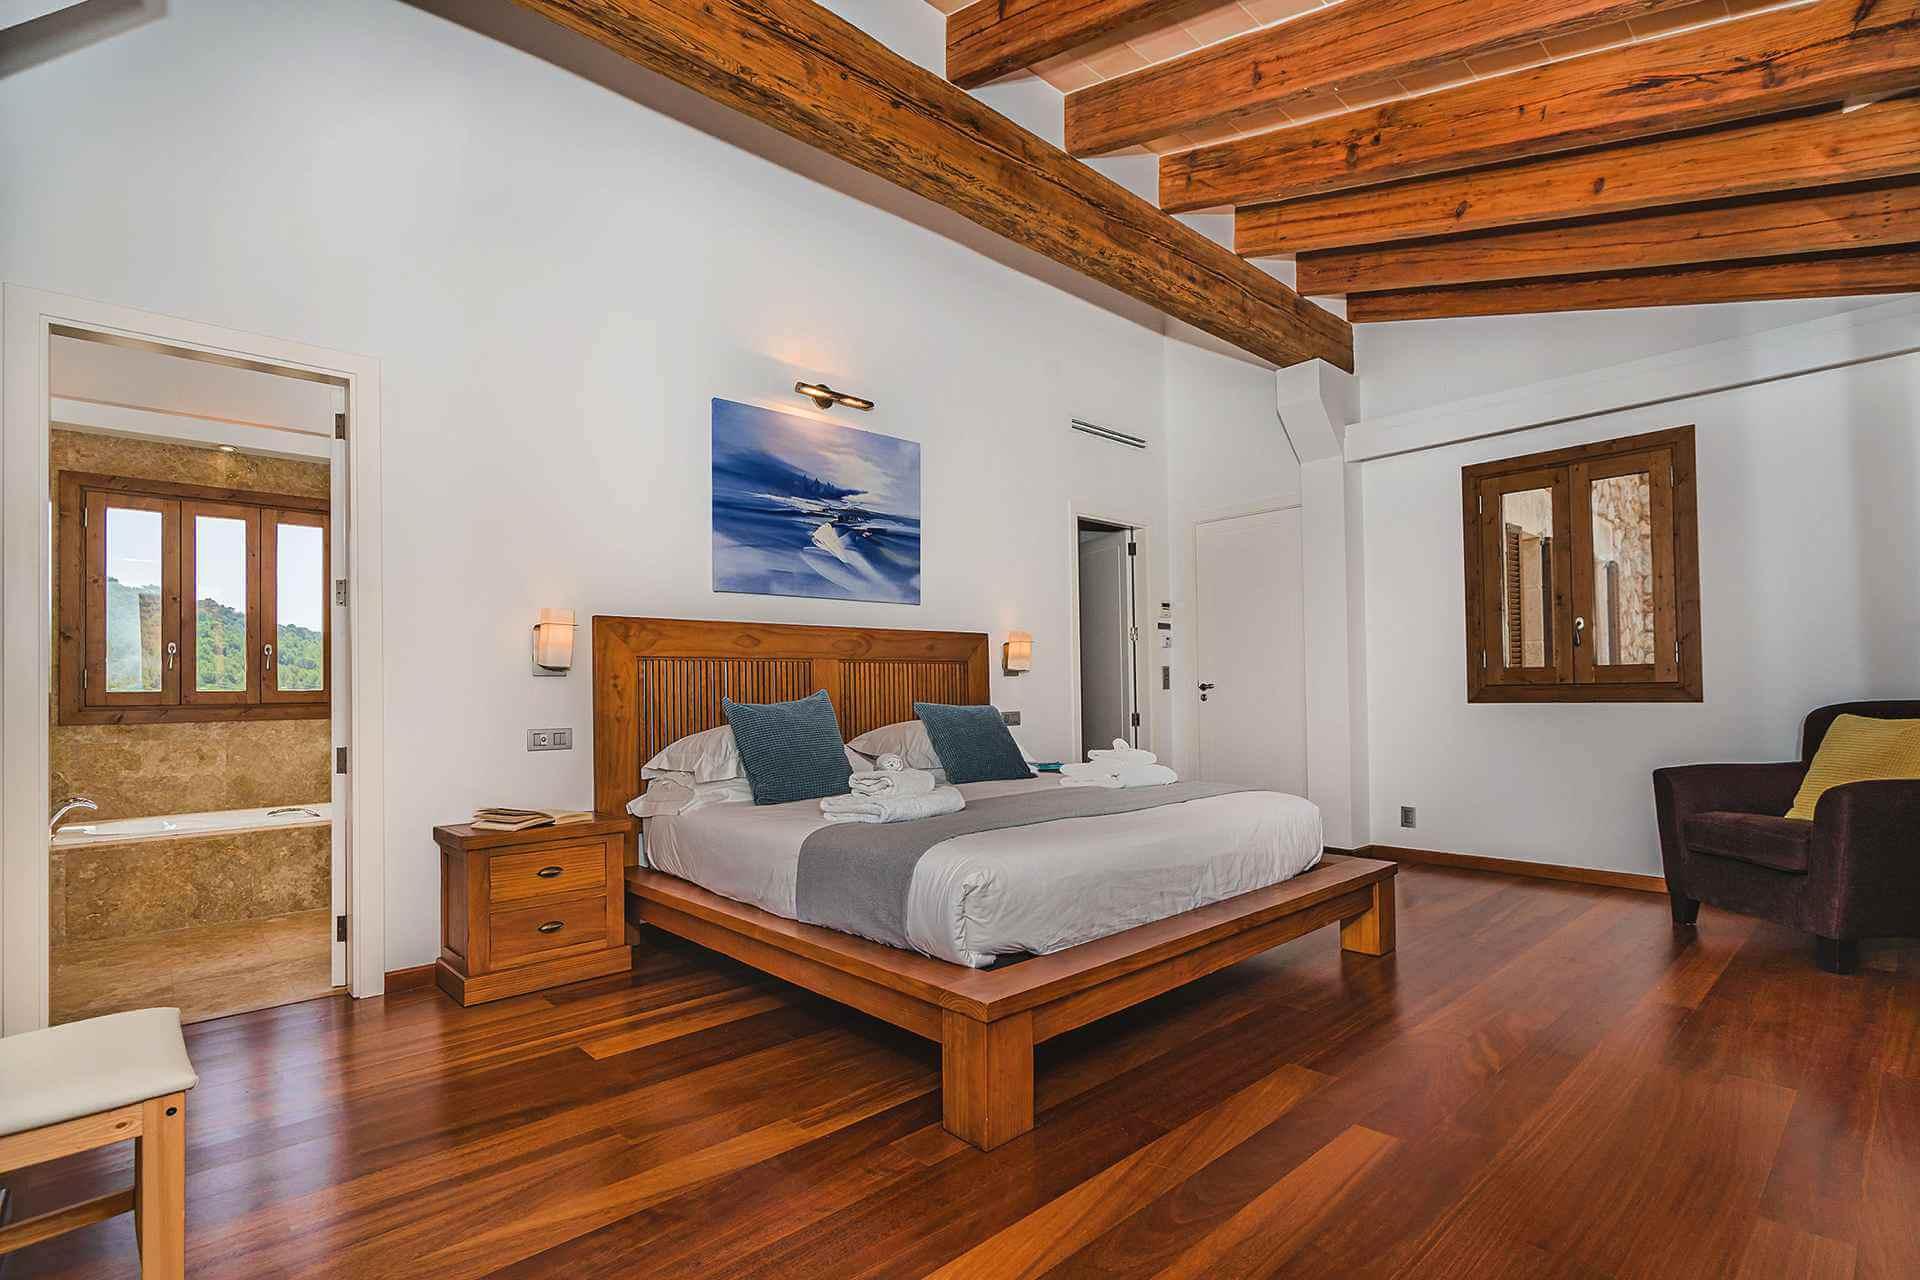 01-348 Luxury Family Finca Mallorca North Bild 19